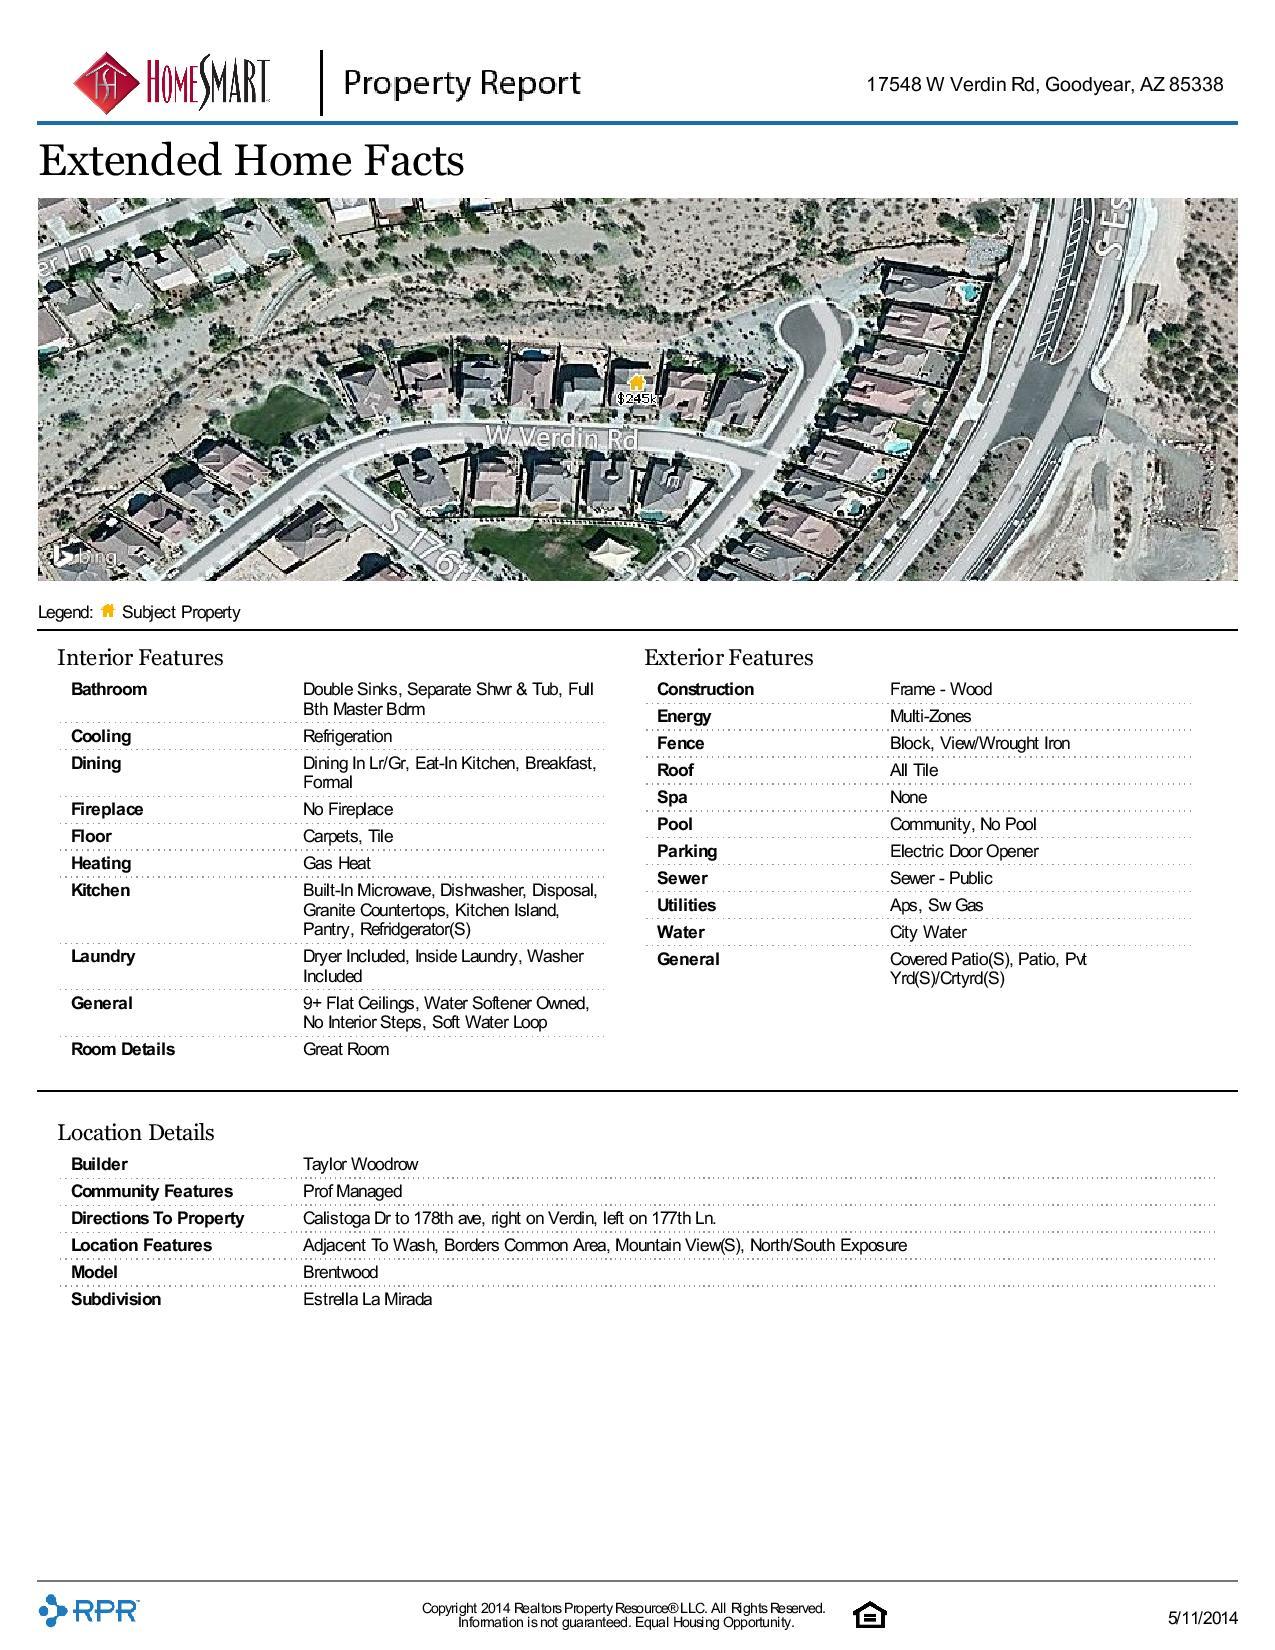 17548-W-Verdin-Rd-Goodyear-AZ-85338-page-004